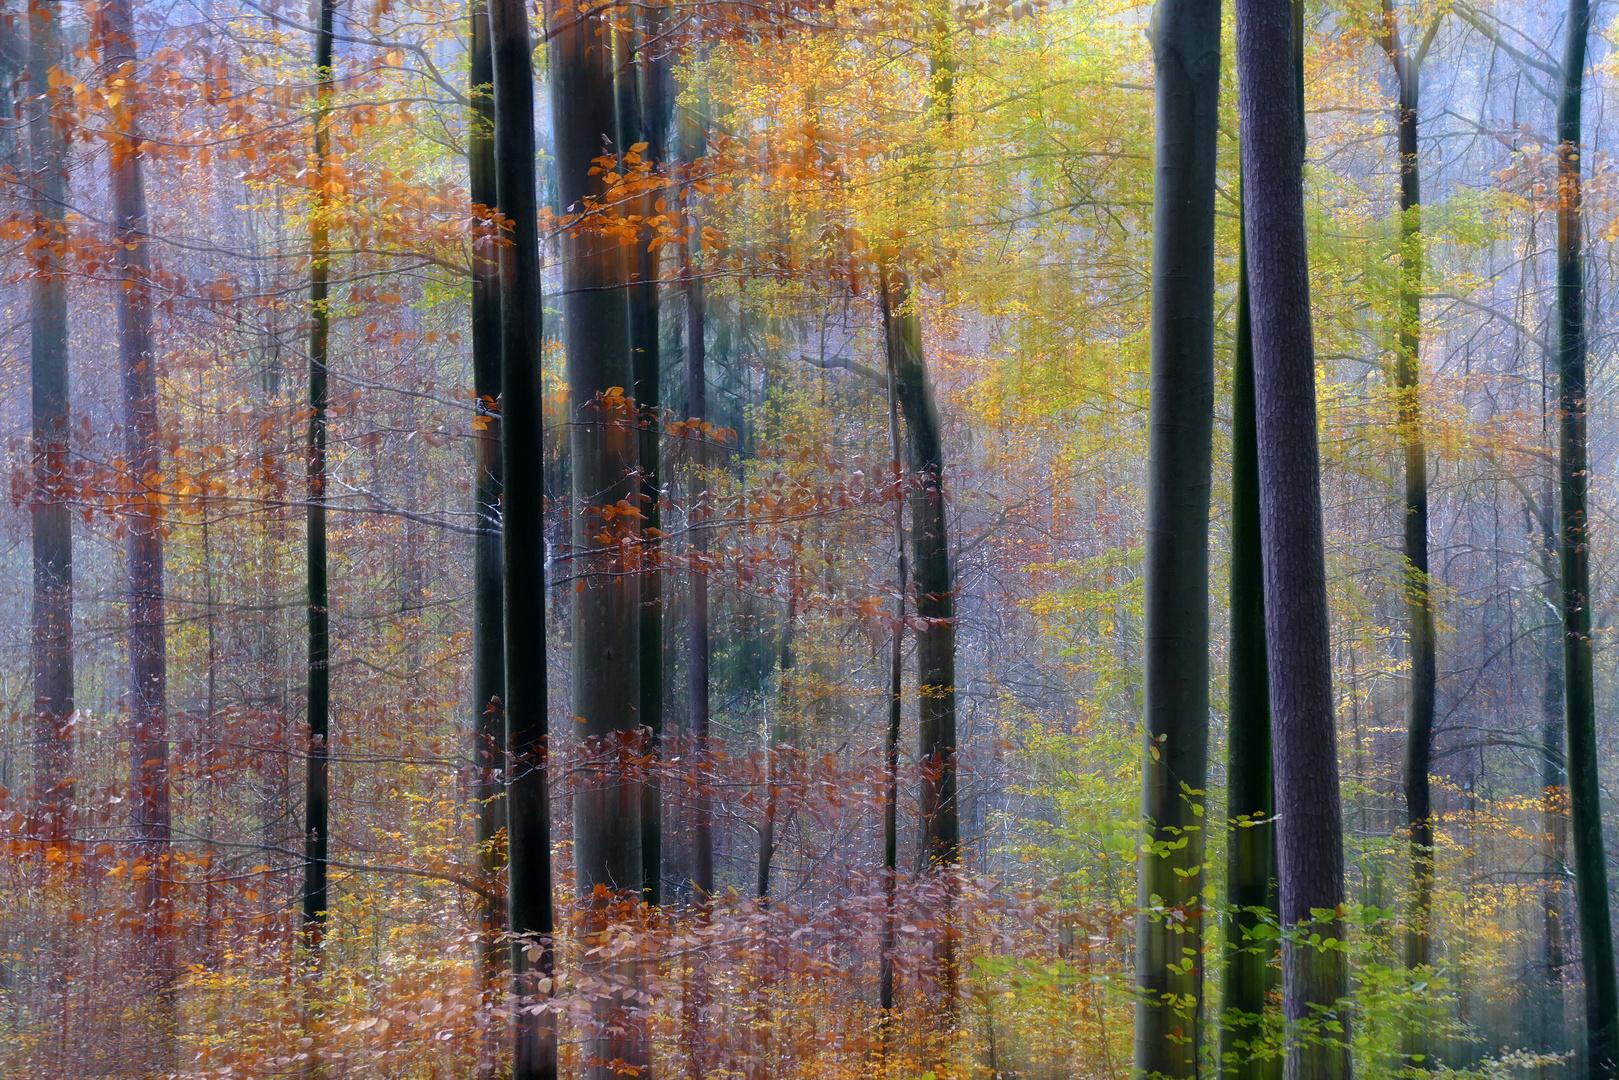 Märchen-Wald